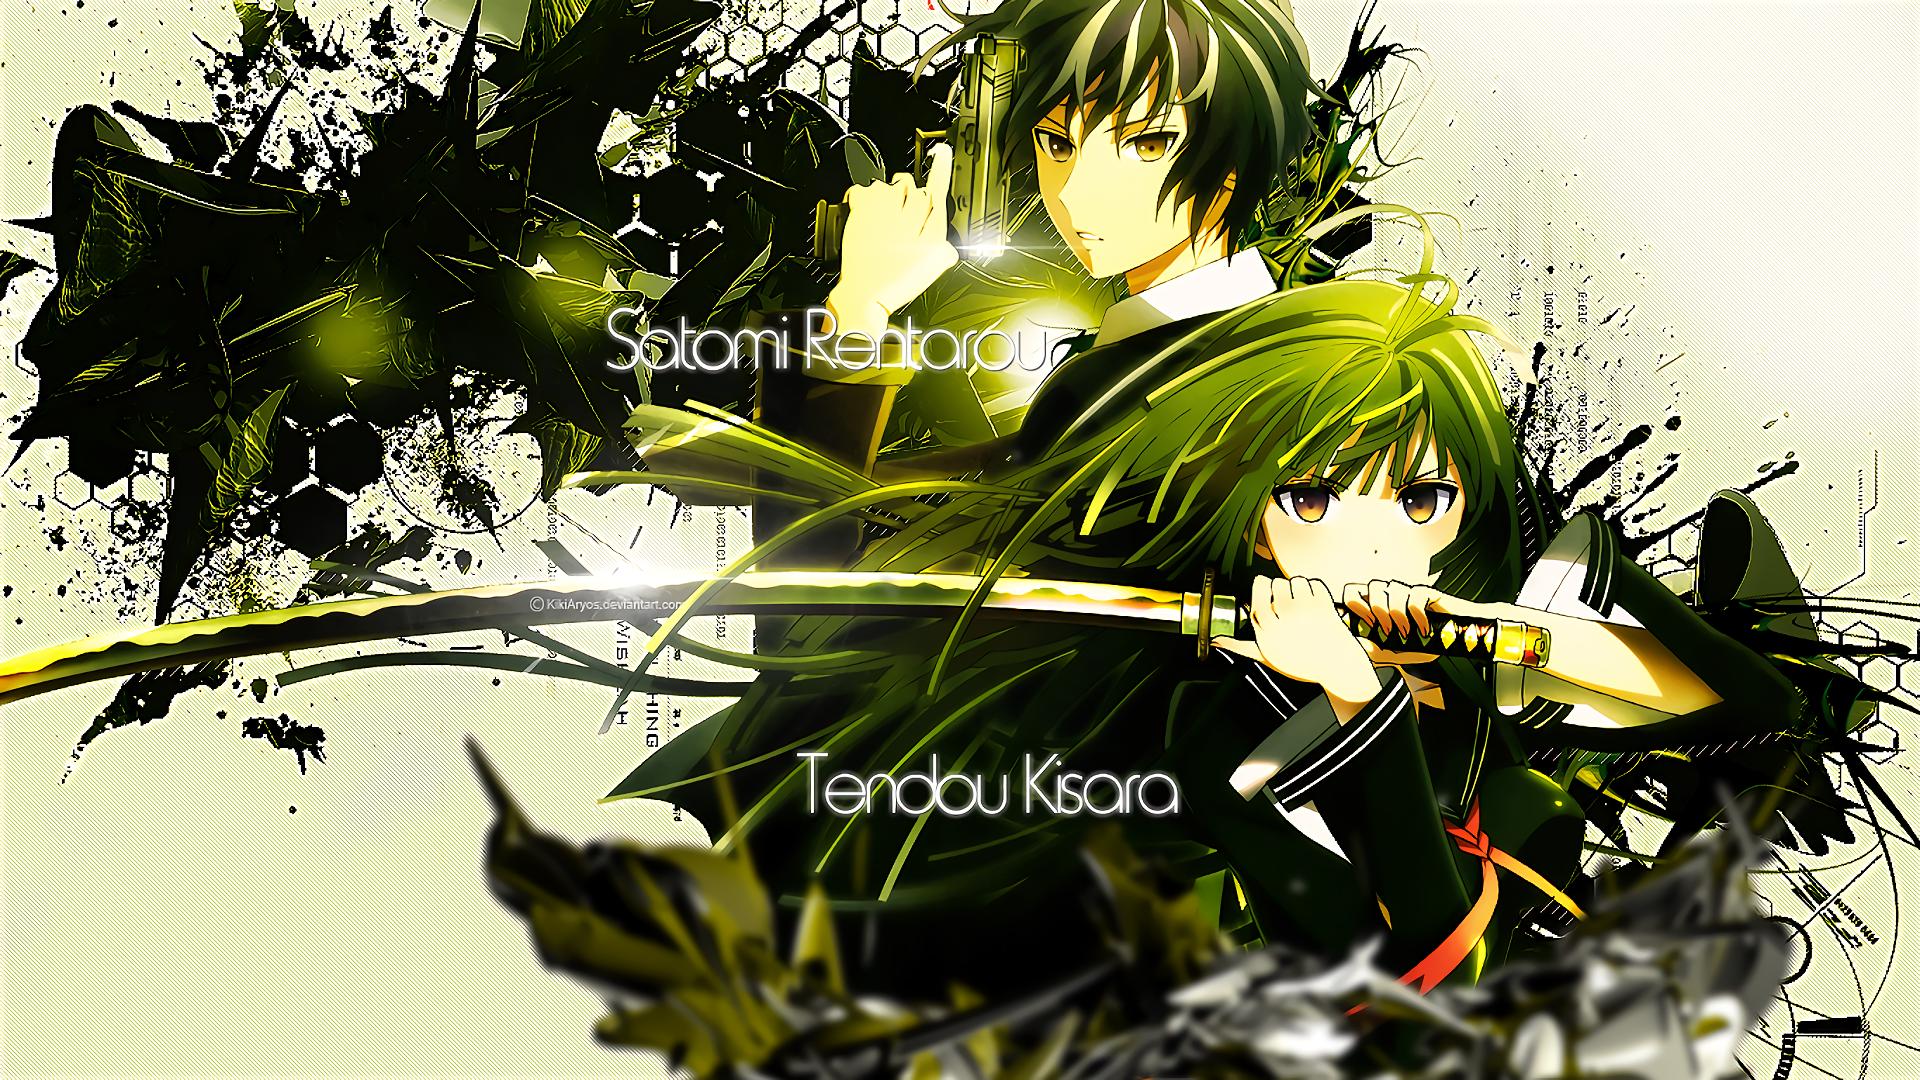 Anime Black Bullet Kisara Tendo Rentaro Satomi Wallpaper